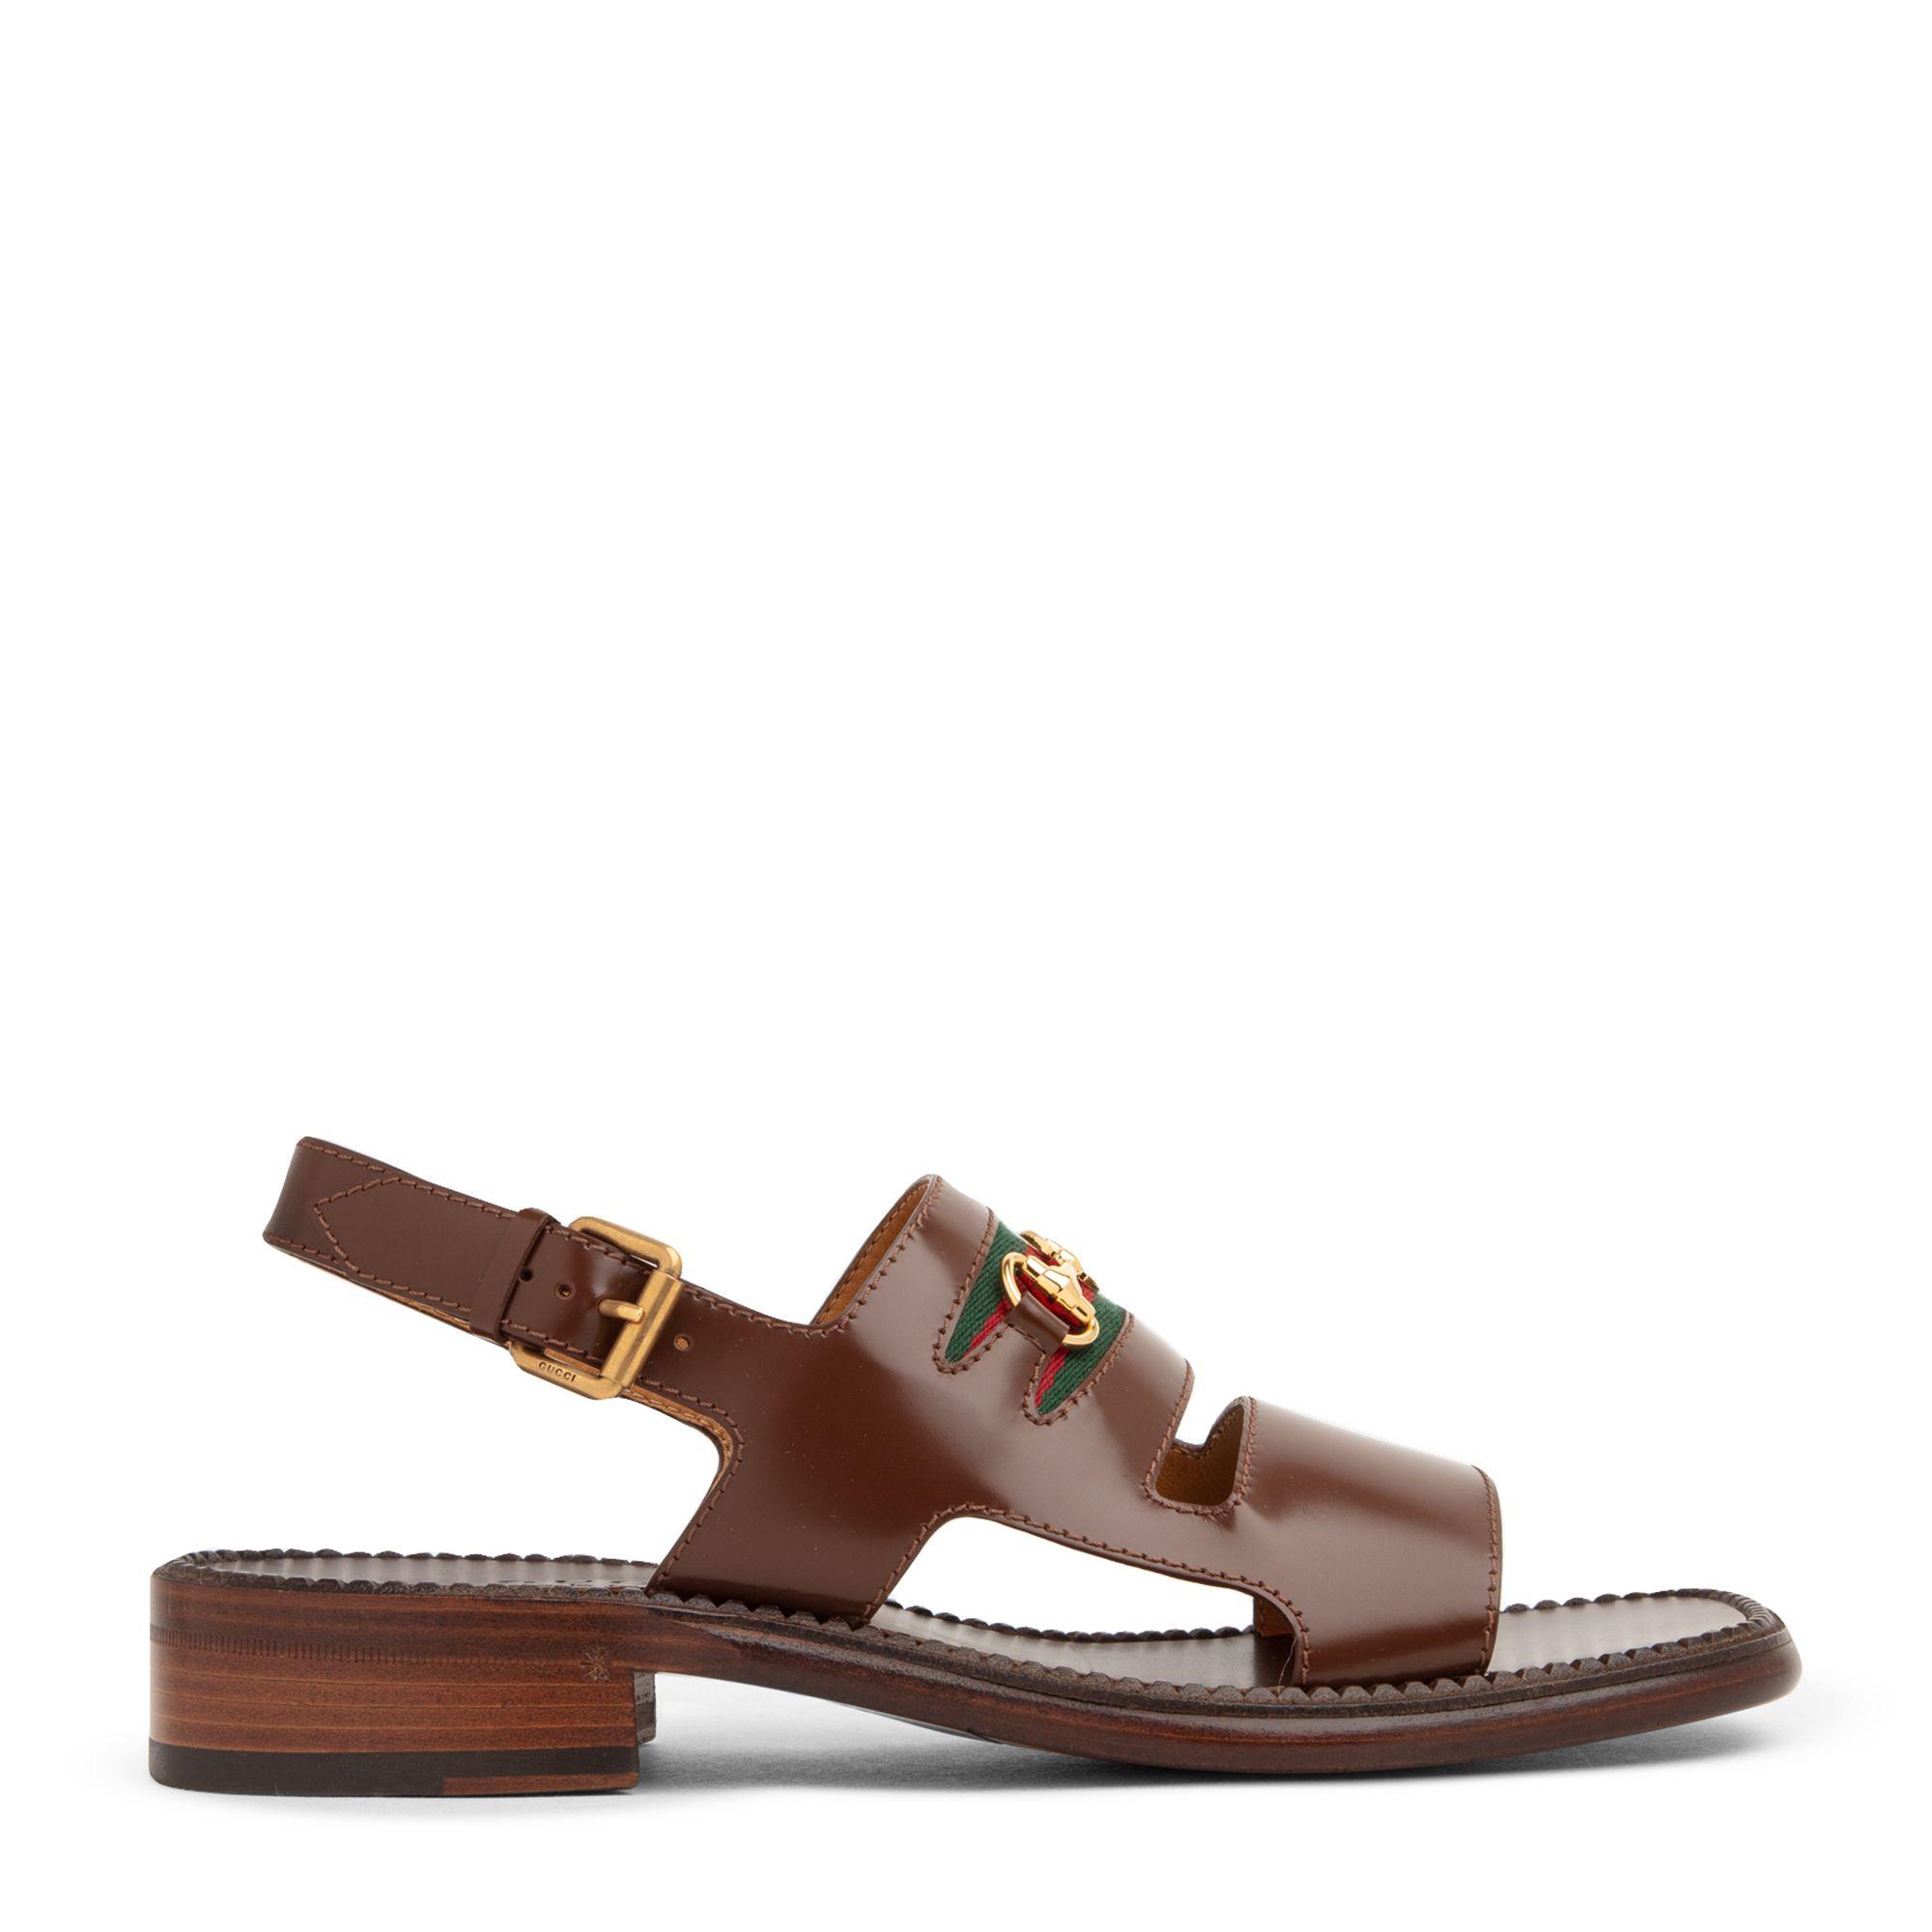 Web leather sandals